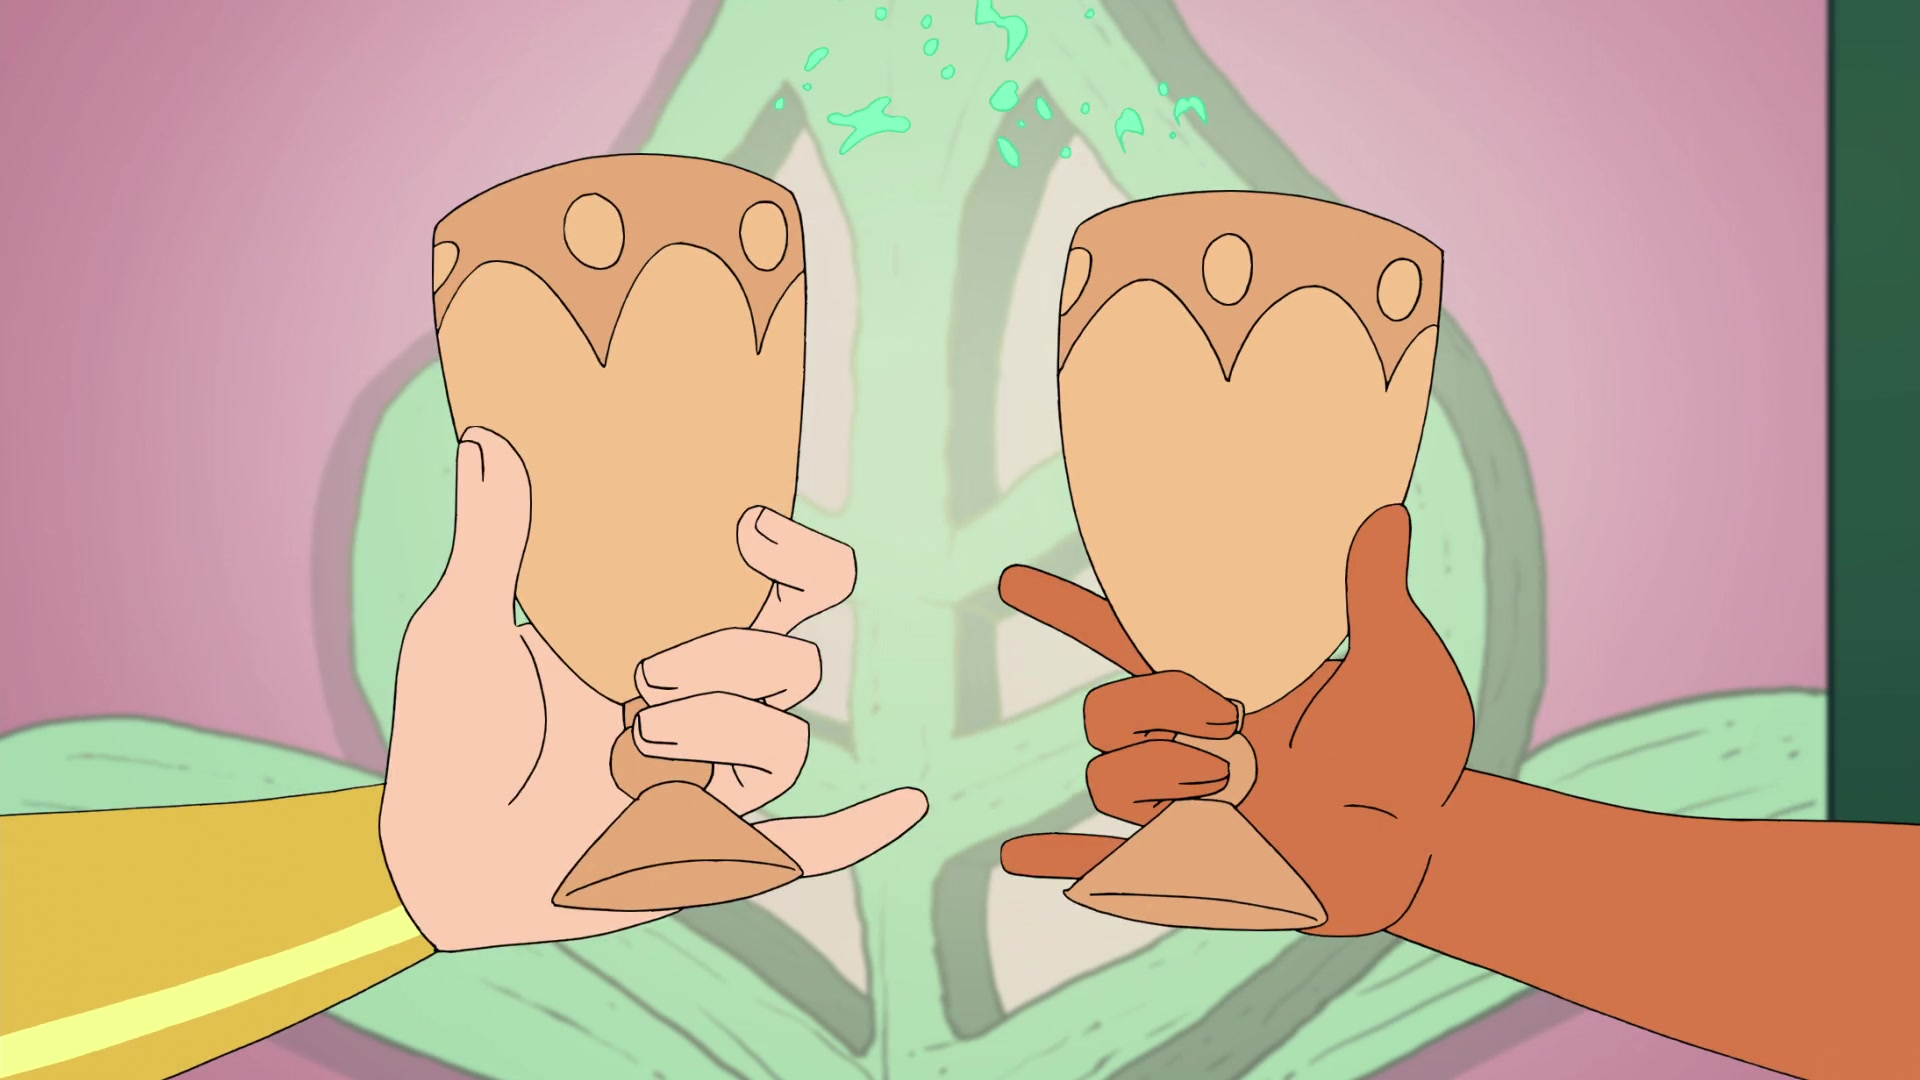 She-Ra and the Princesses of Power S04E03